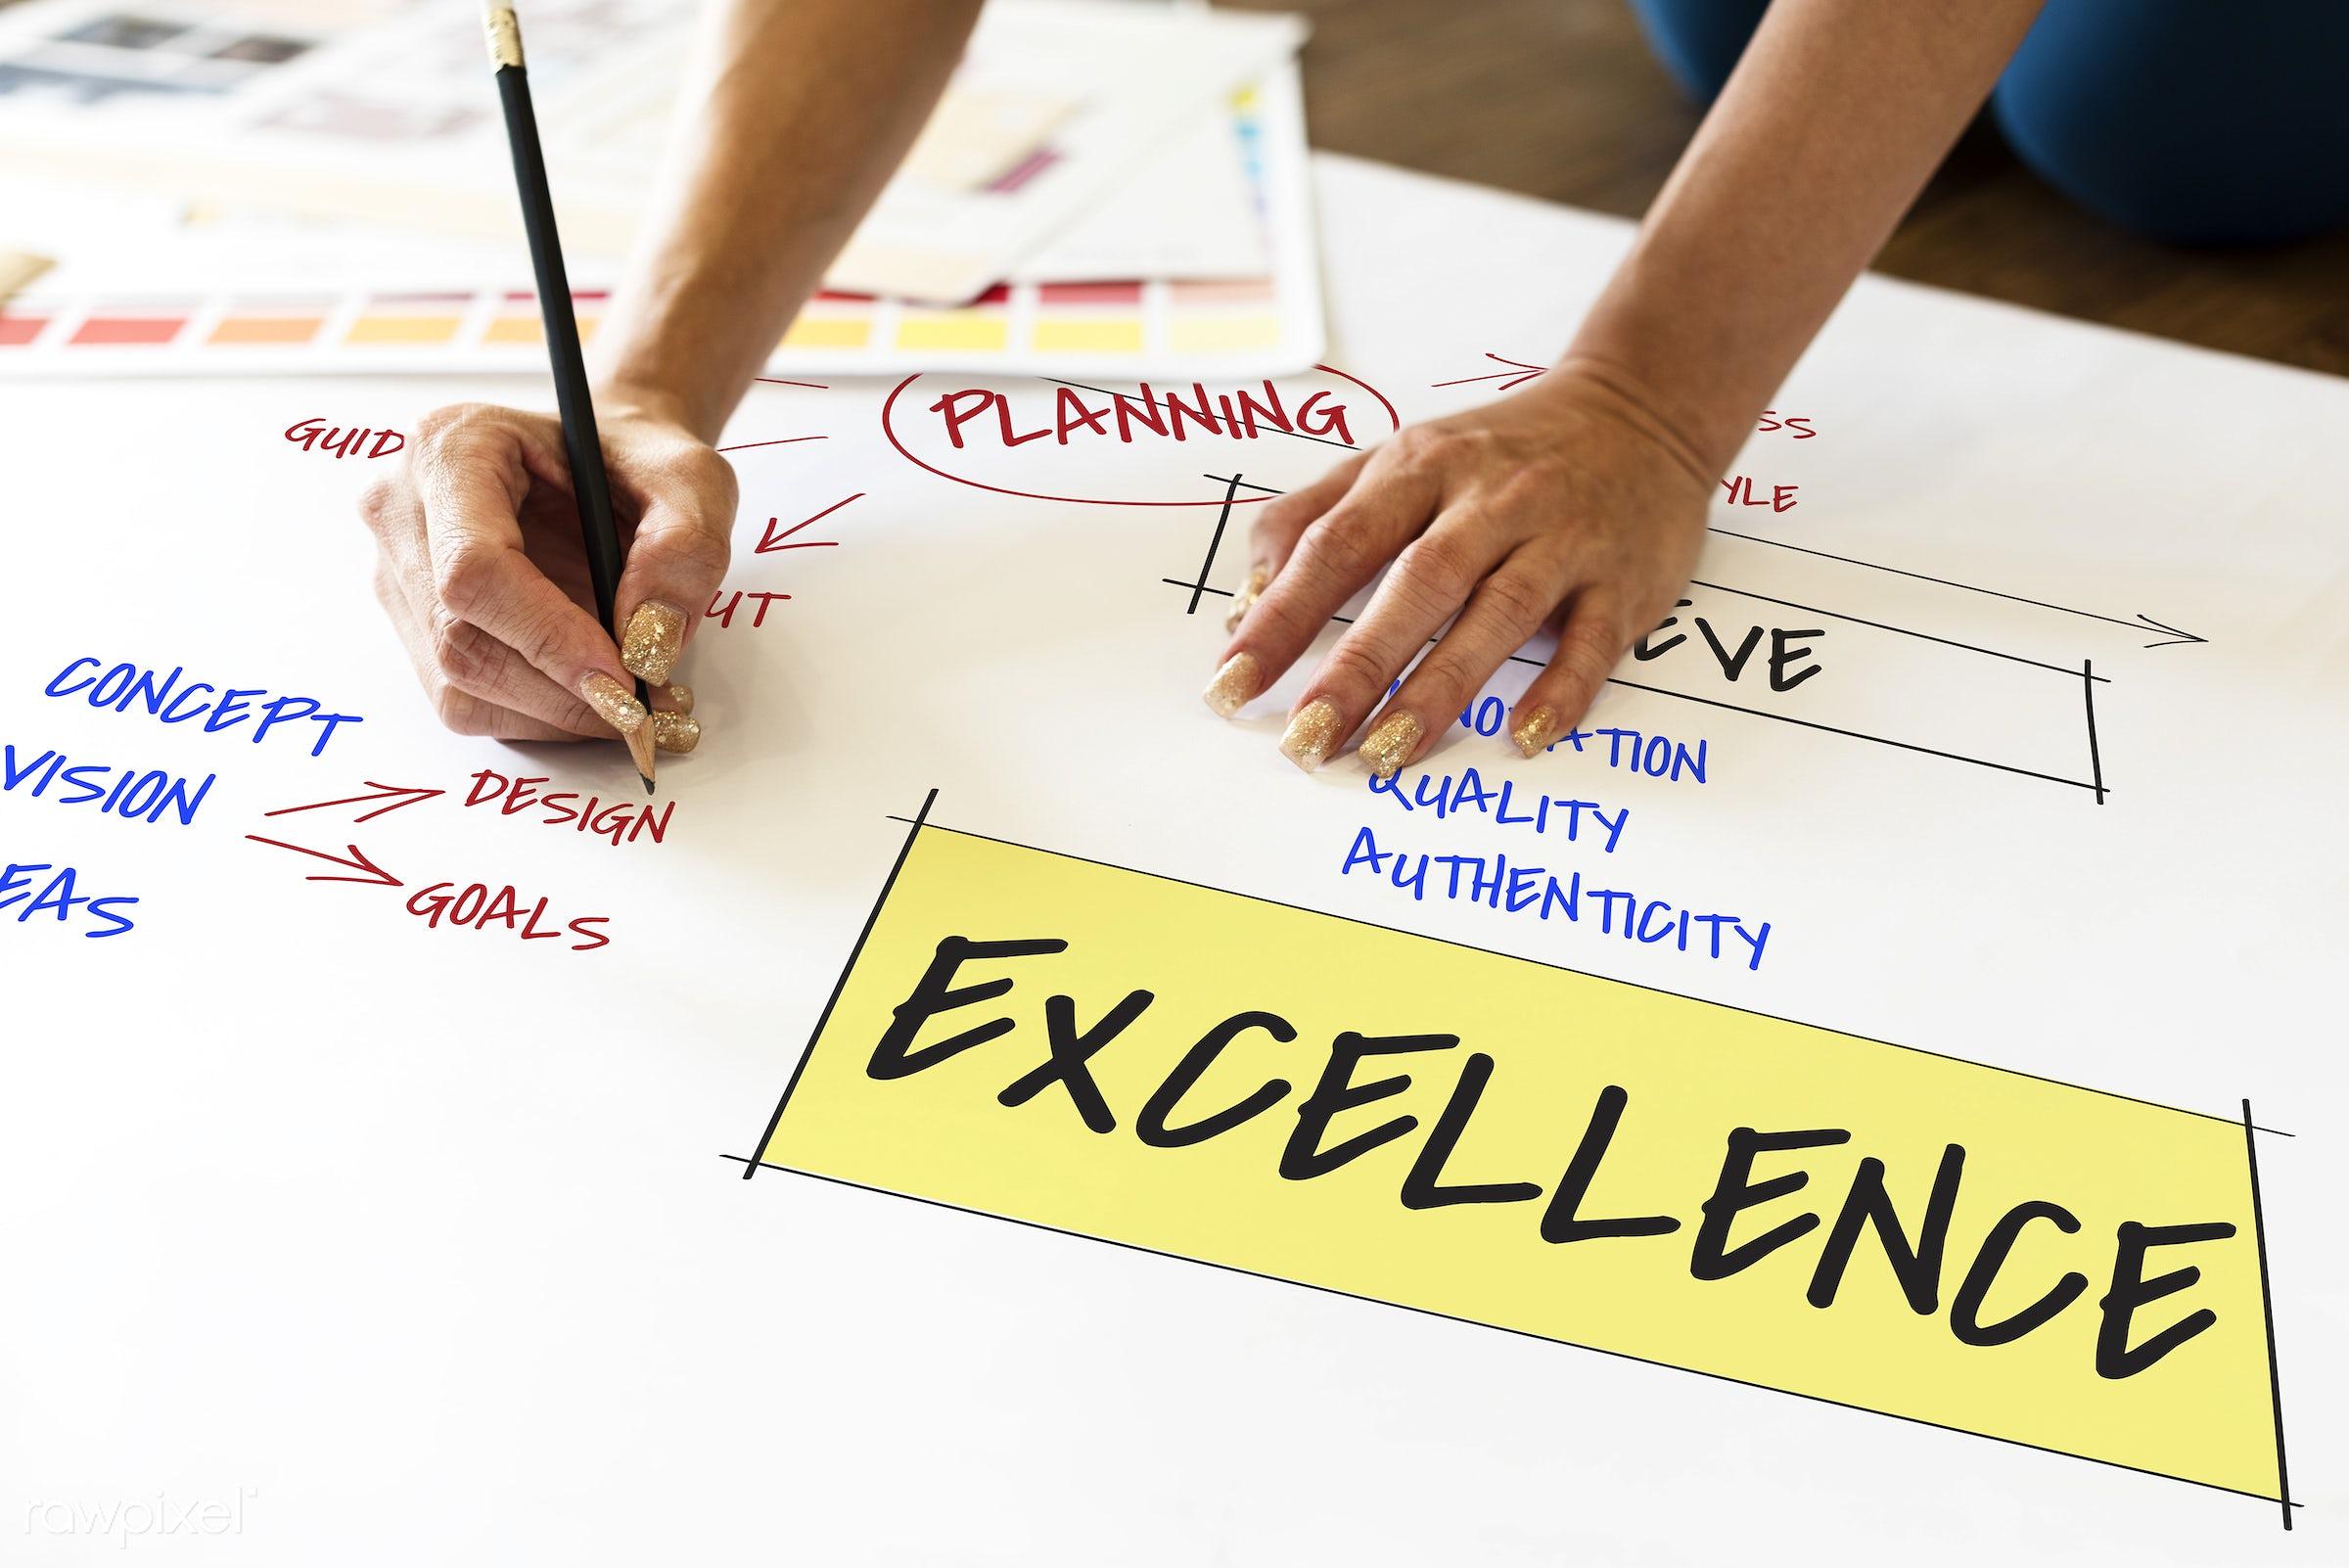 achieve, art, authenticity, be creative, brainstorm, chart, creation, creative, creativity, design, diagram, drawing,...